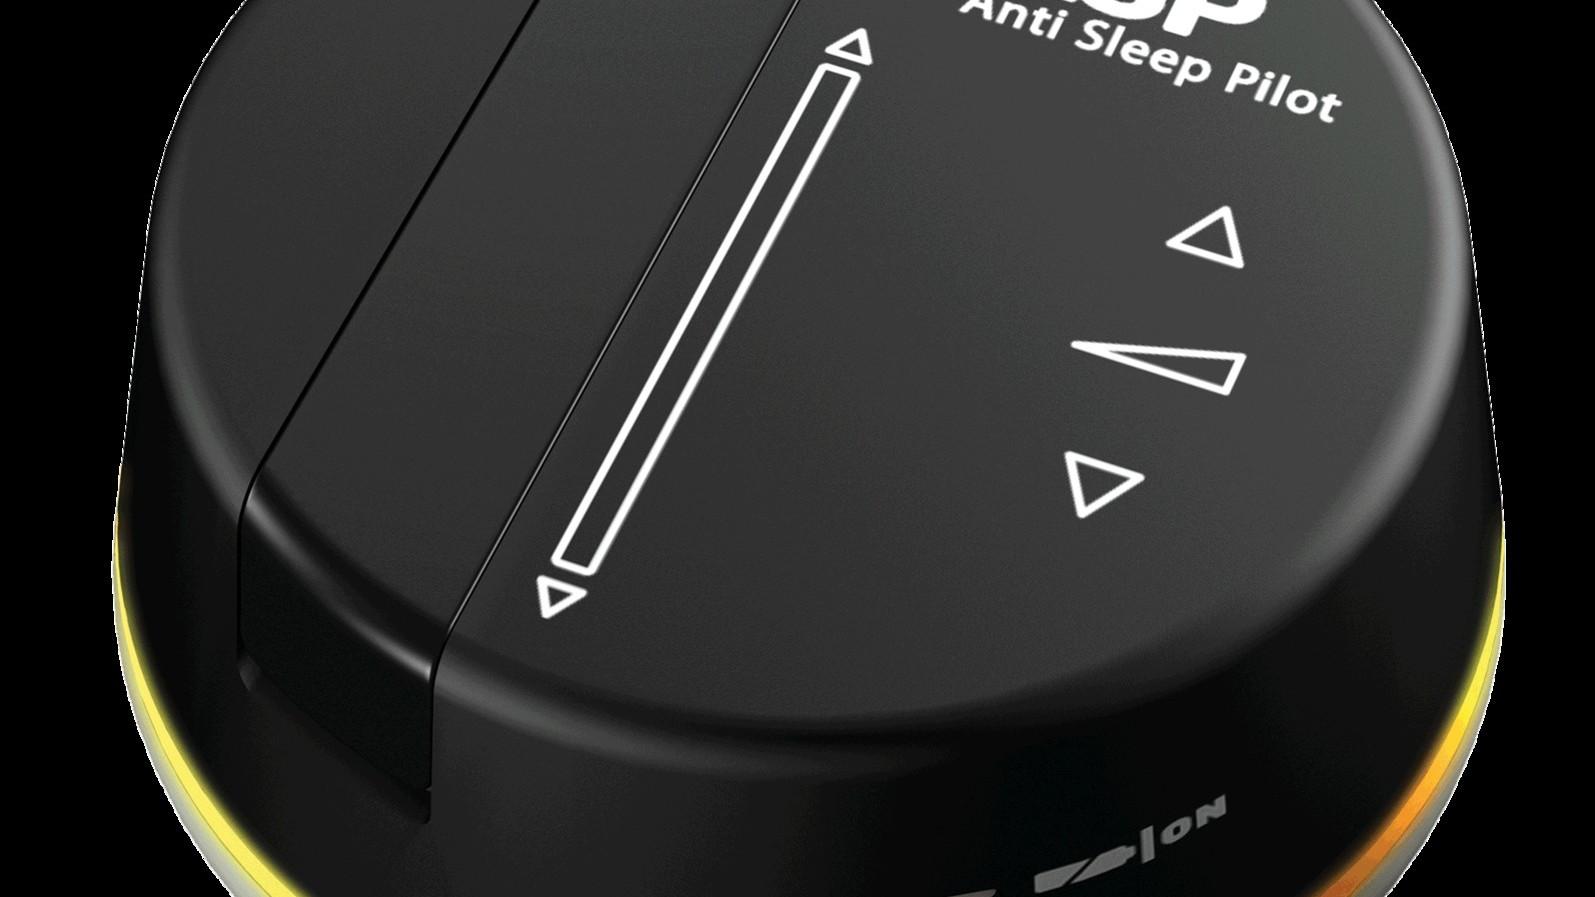 Anti-Sleep Pilot (ASP) system